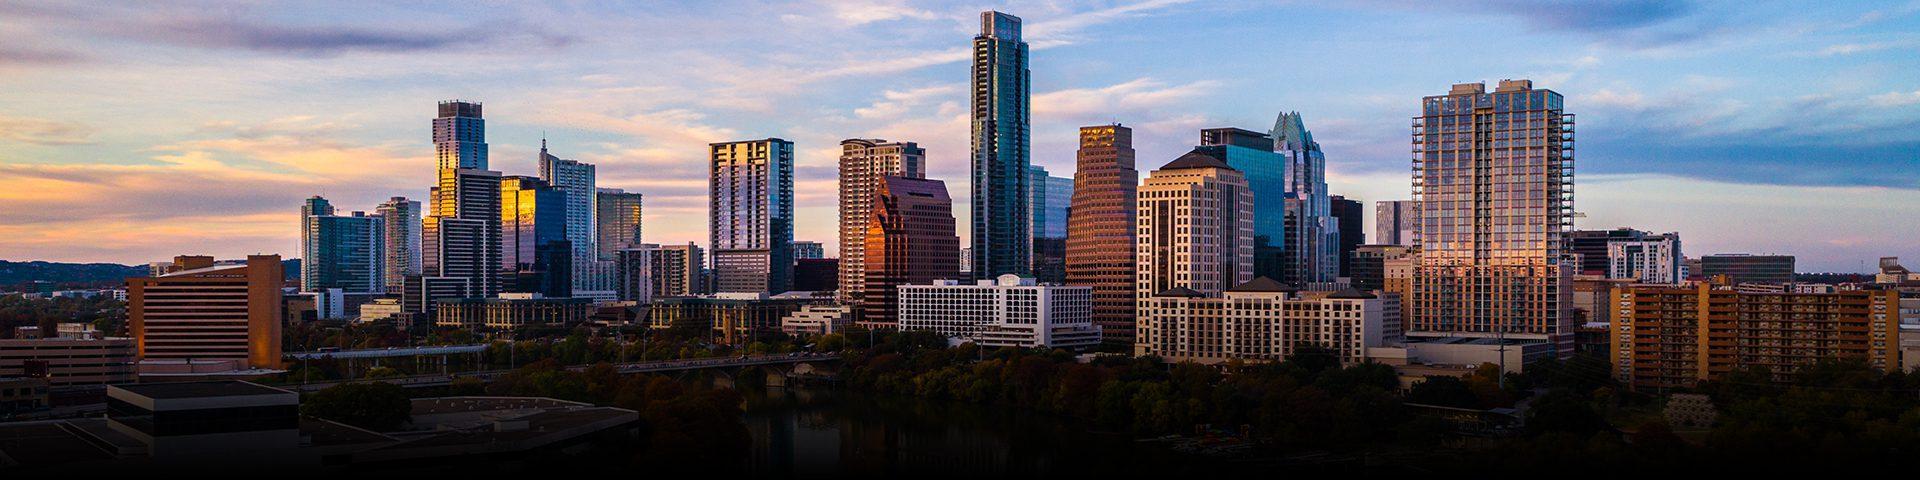 Austin, Texas - Downtown Skyline